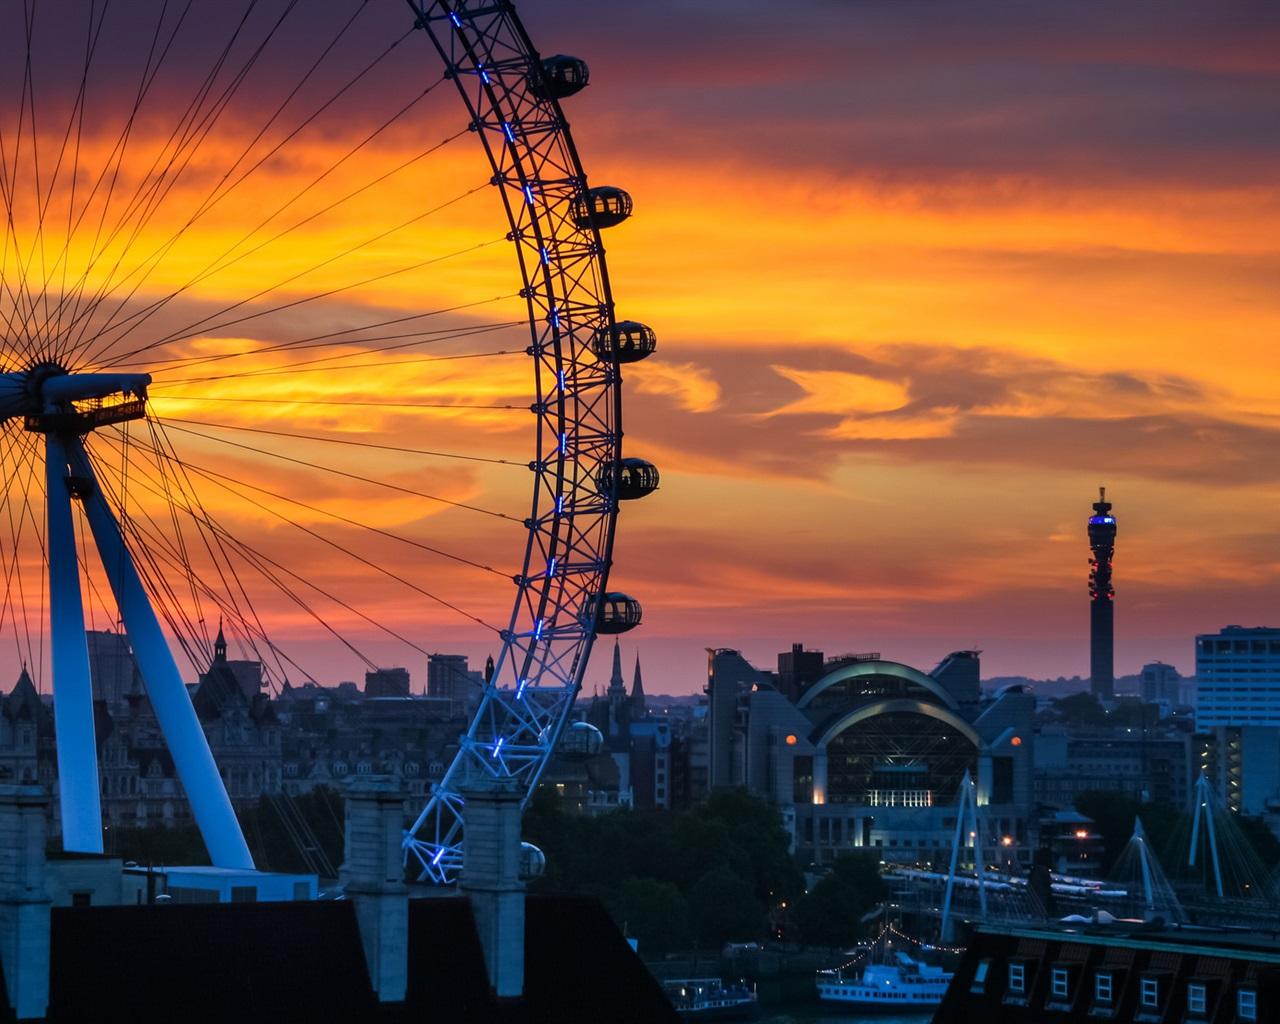 Wallpaper London England Ferris Wheel Sunset City House 1920x1200 HD Picture Image